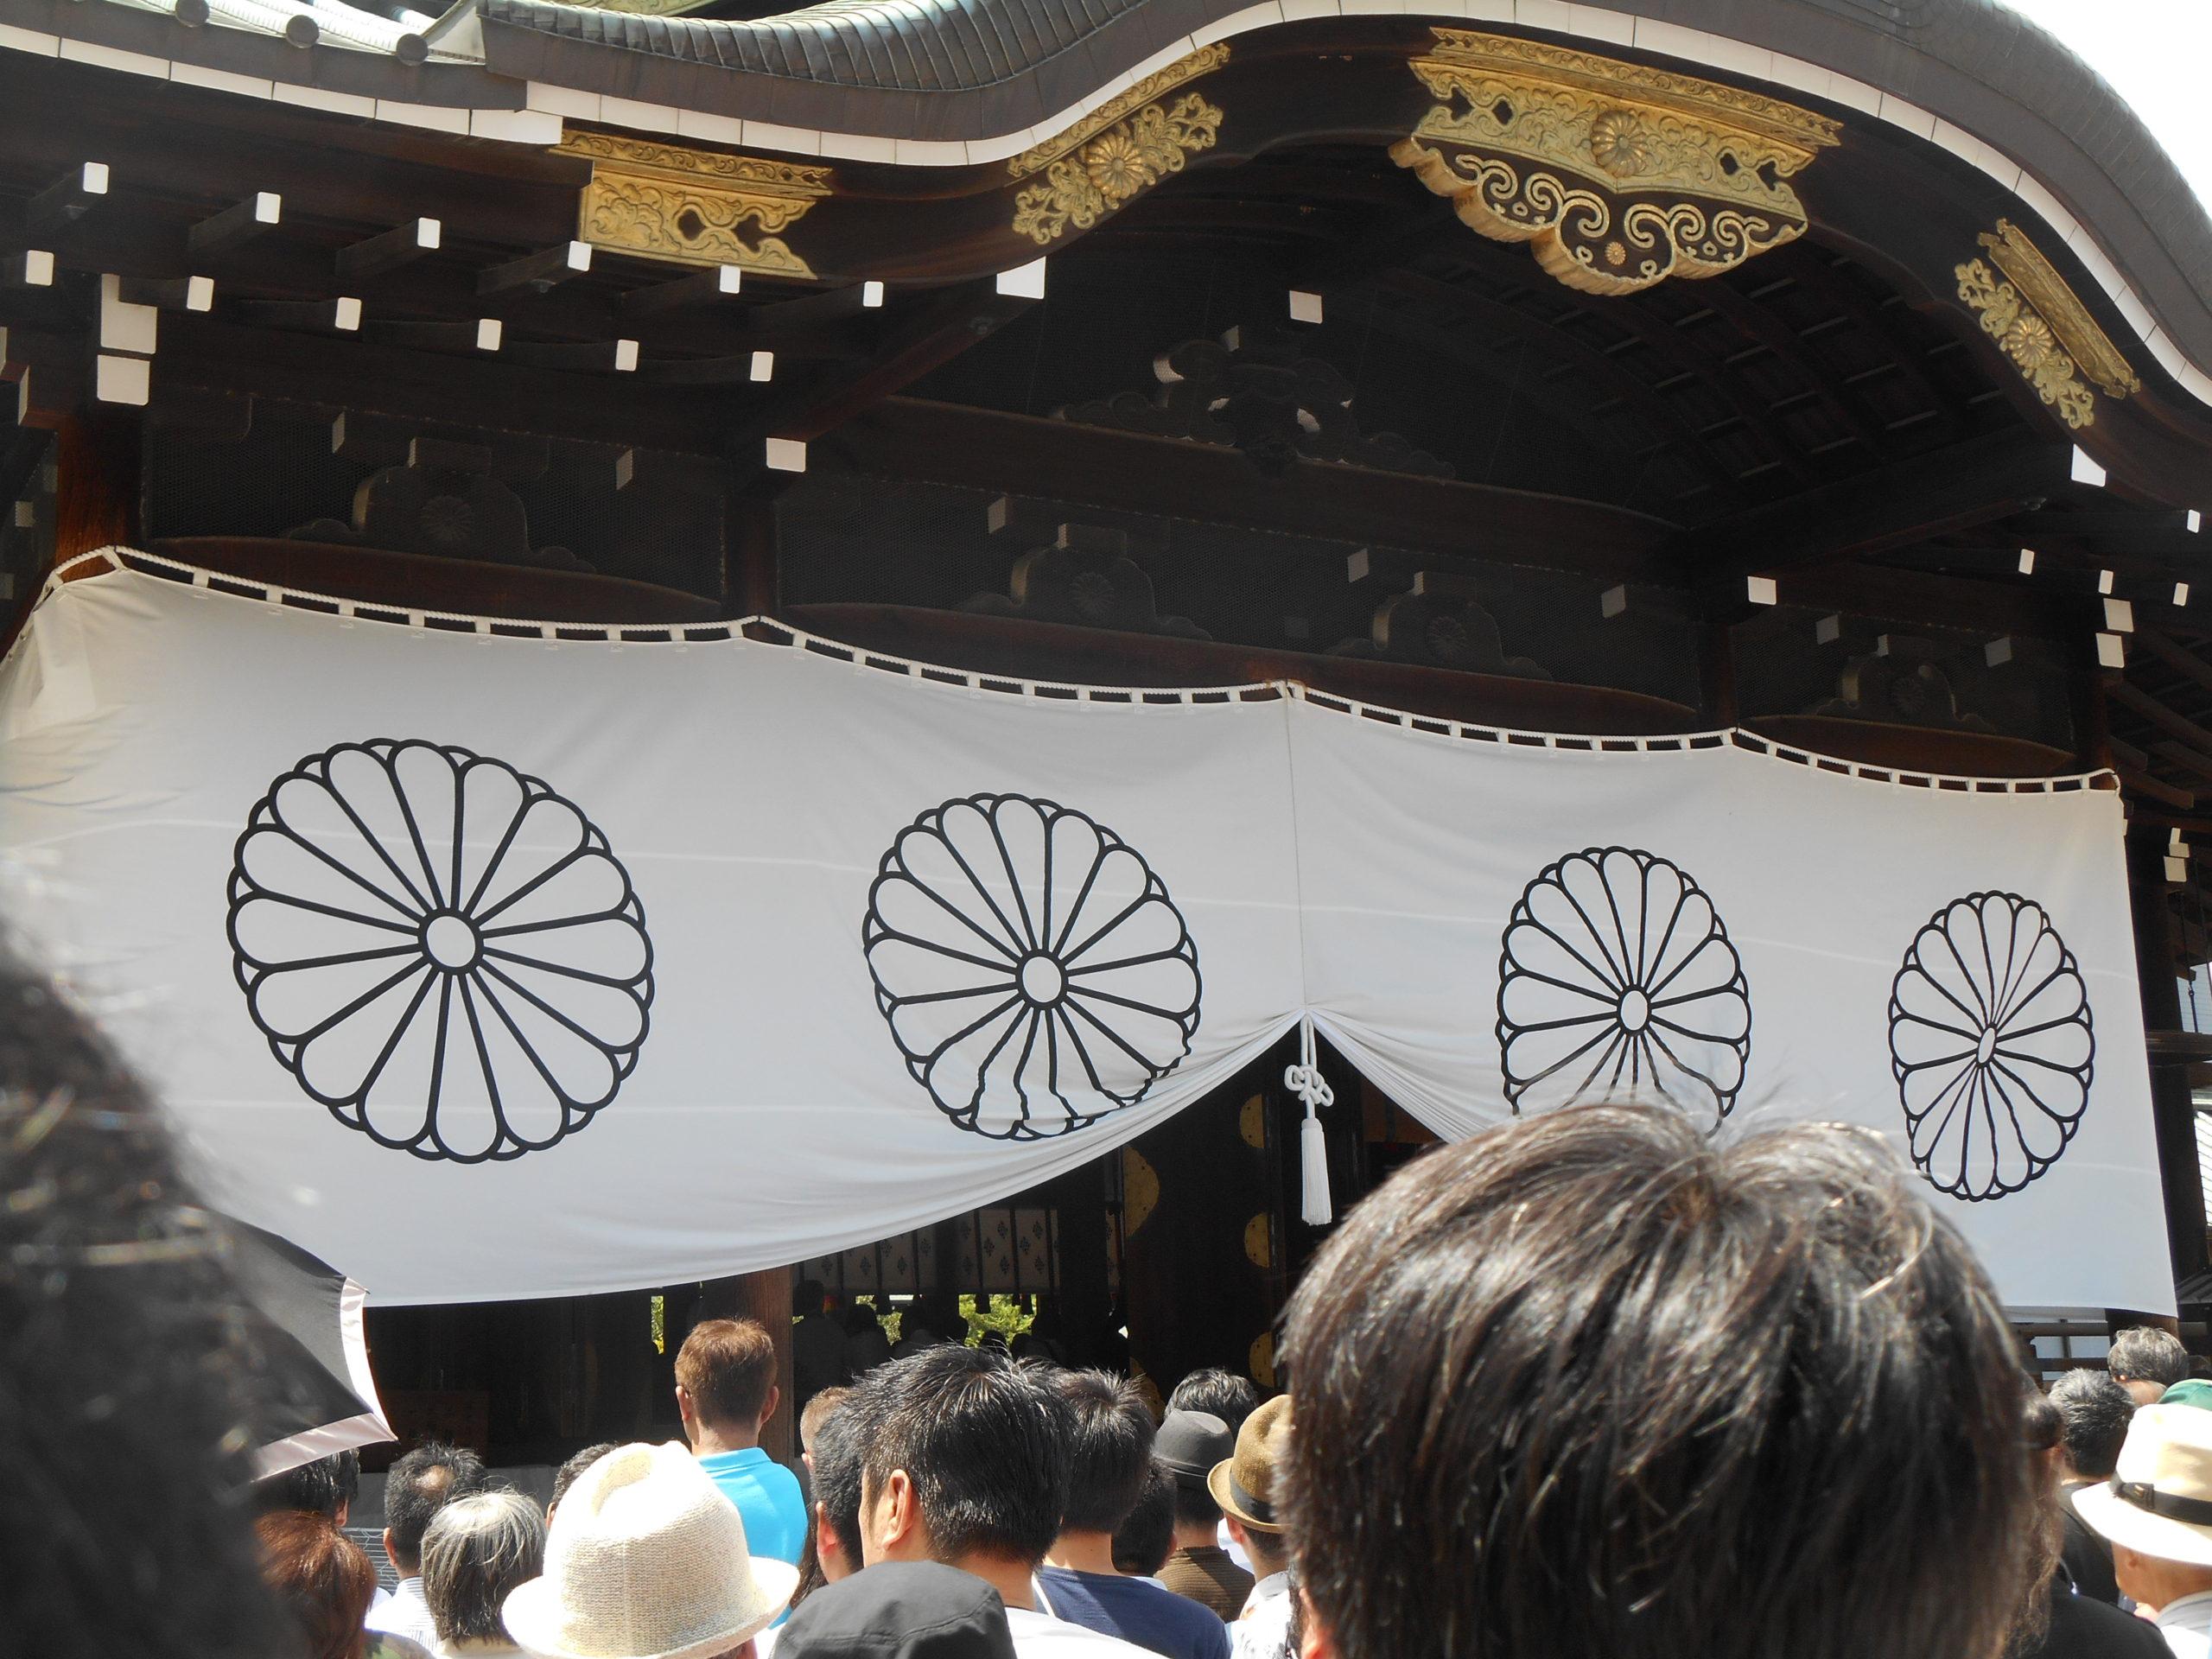 DSCN1114 scaled - 8月15日終戦記念日